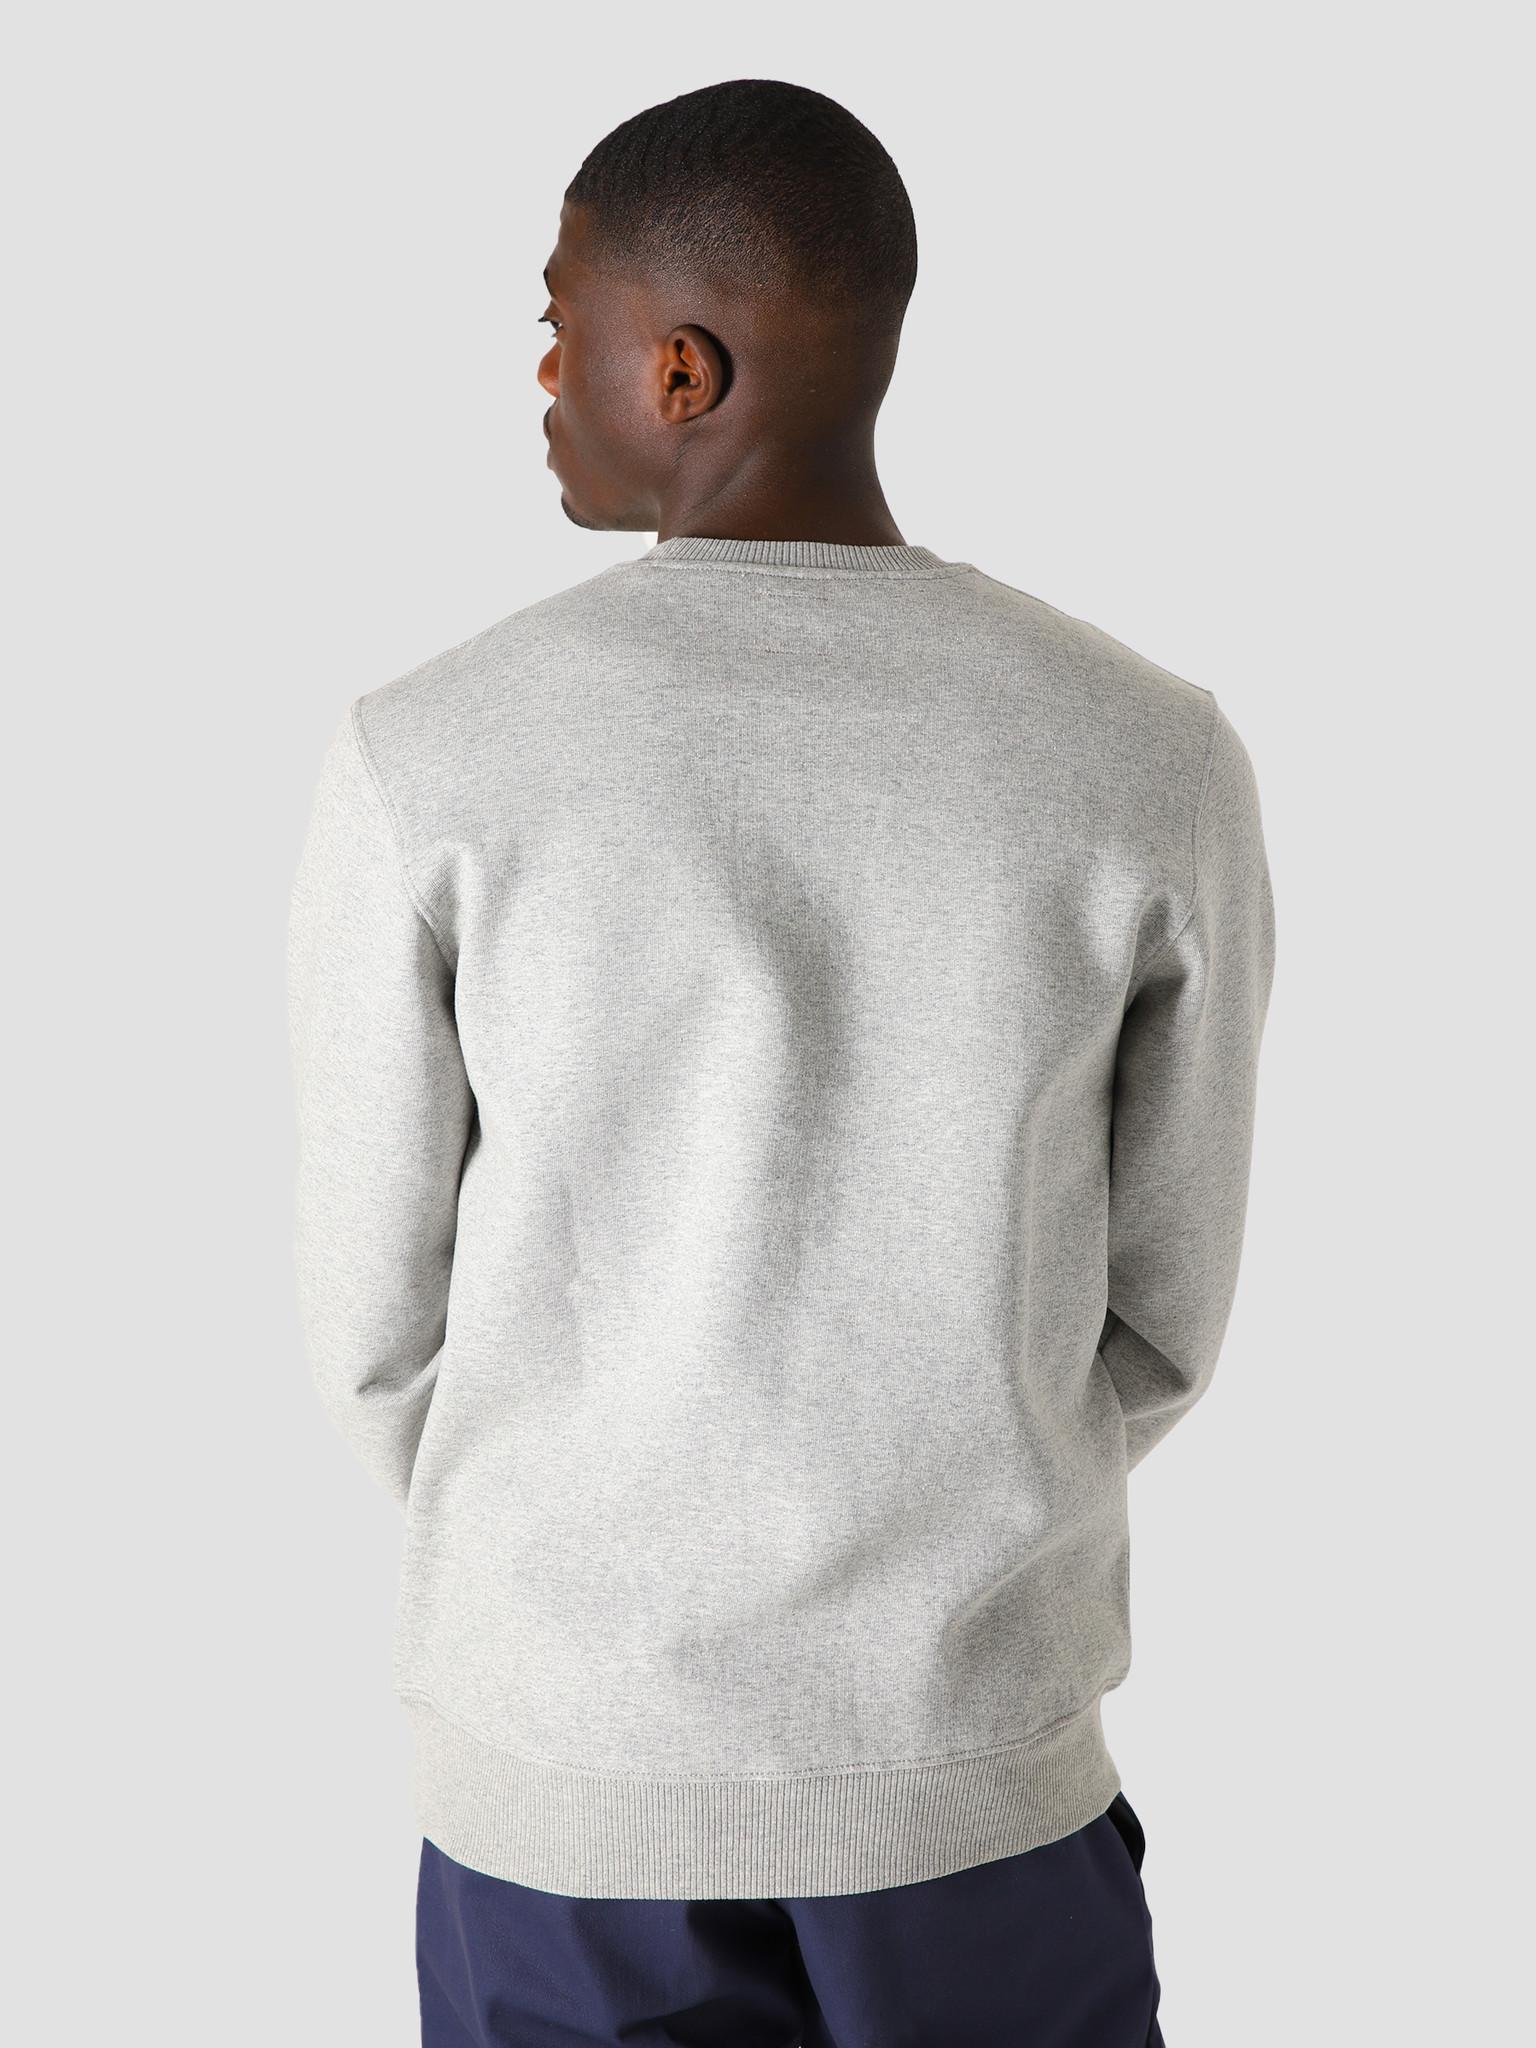 Obey Obey x Dickies Heavyweight Crewneck Sweater Grey Melange 112480087GYM